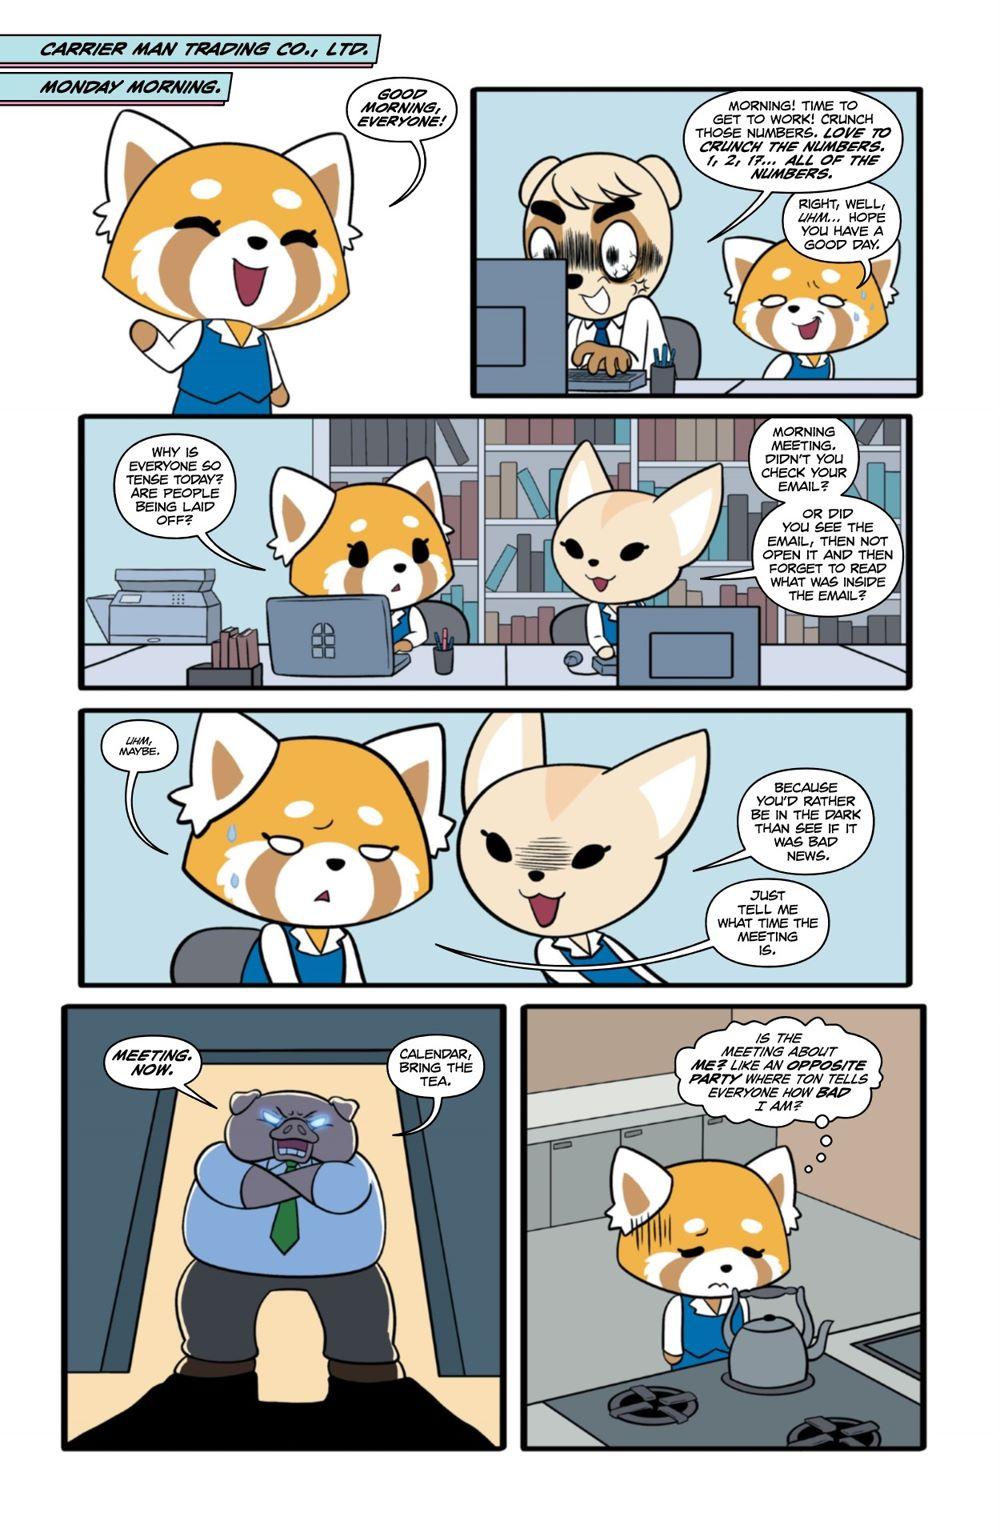 AGGRETSUKO-MHW-2-MARKETING-04-1 ComicList Previews: AGGRETSUKO MEET HER WORLD #2